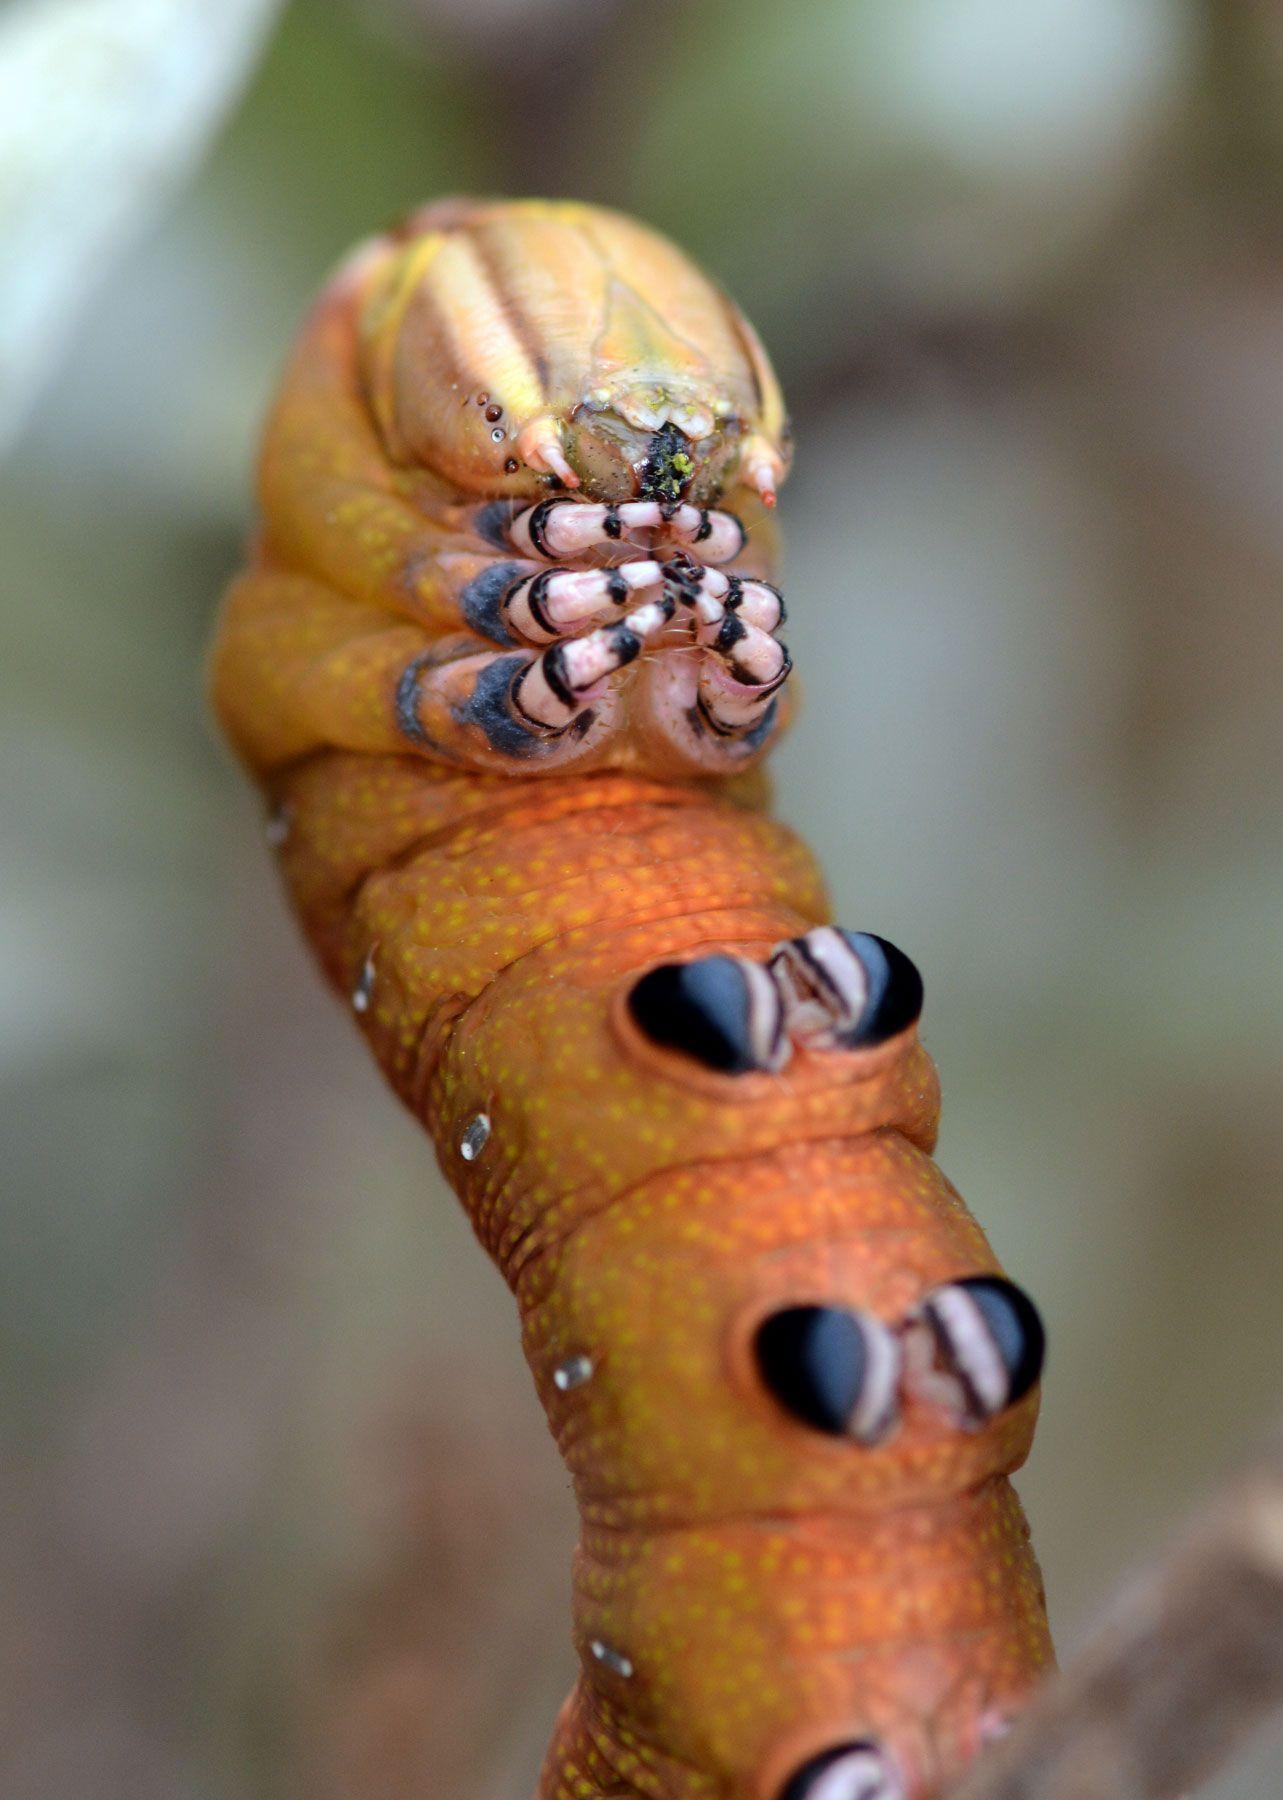 caterpillar mouth Google Search Caterpillar, Creepy